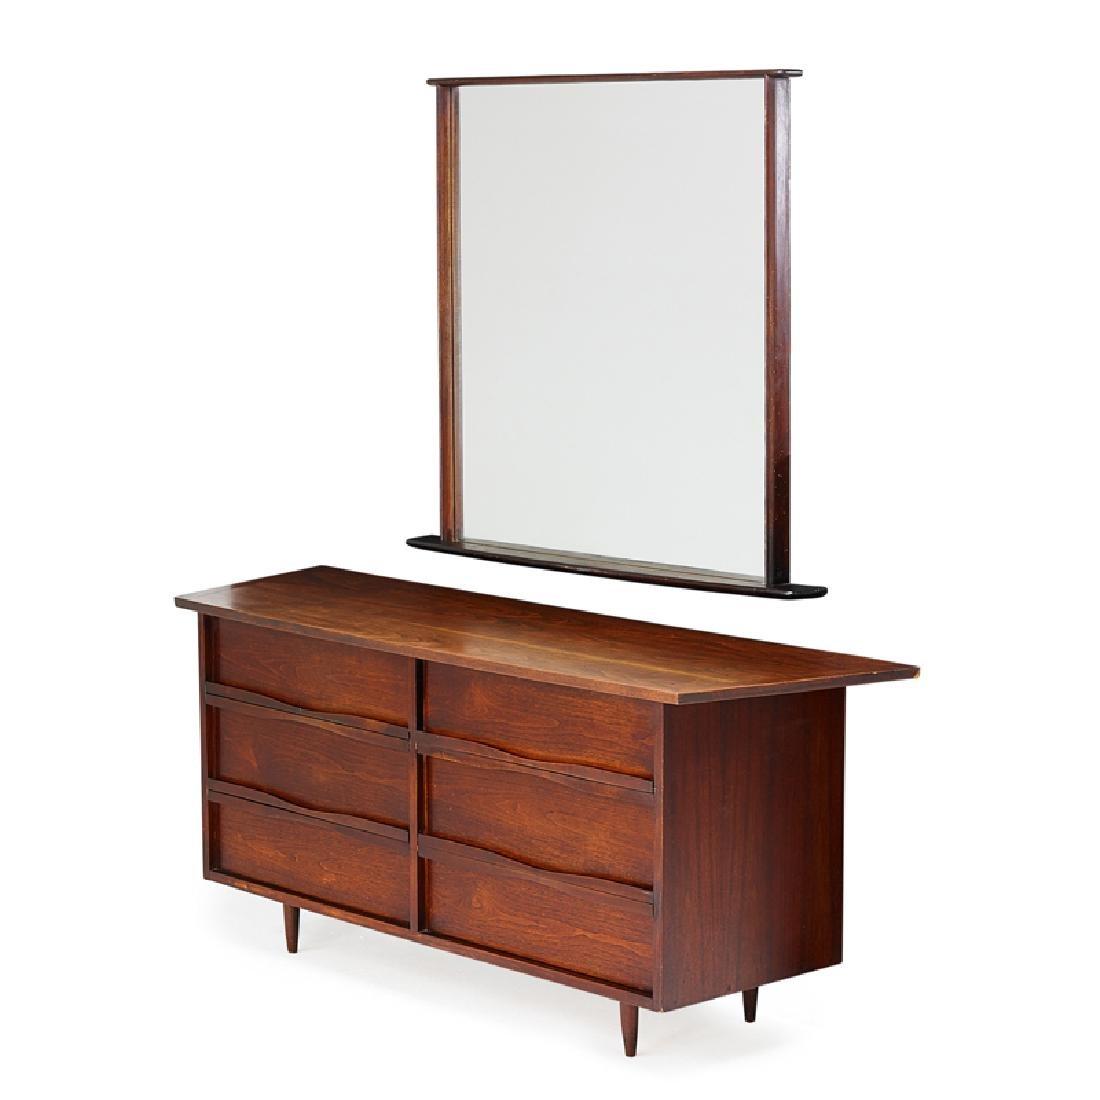 GEORGE NAKASHIMA; WIDDICOMB Dresser w/ mirror